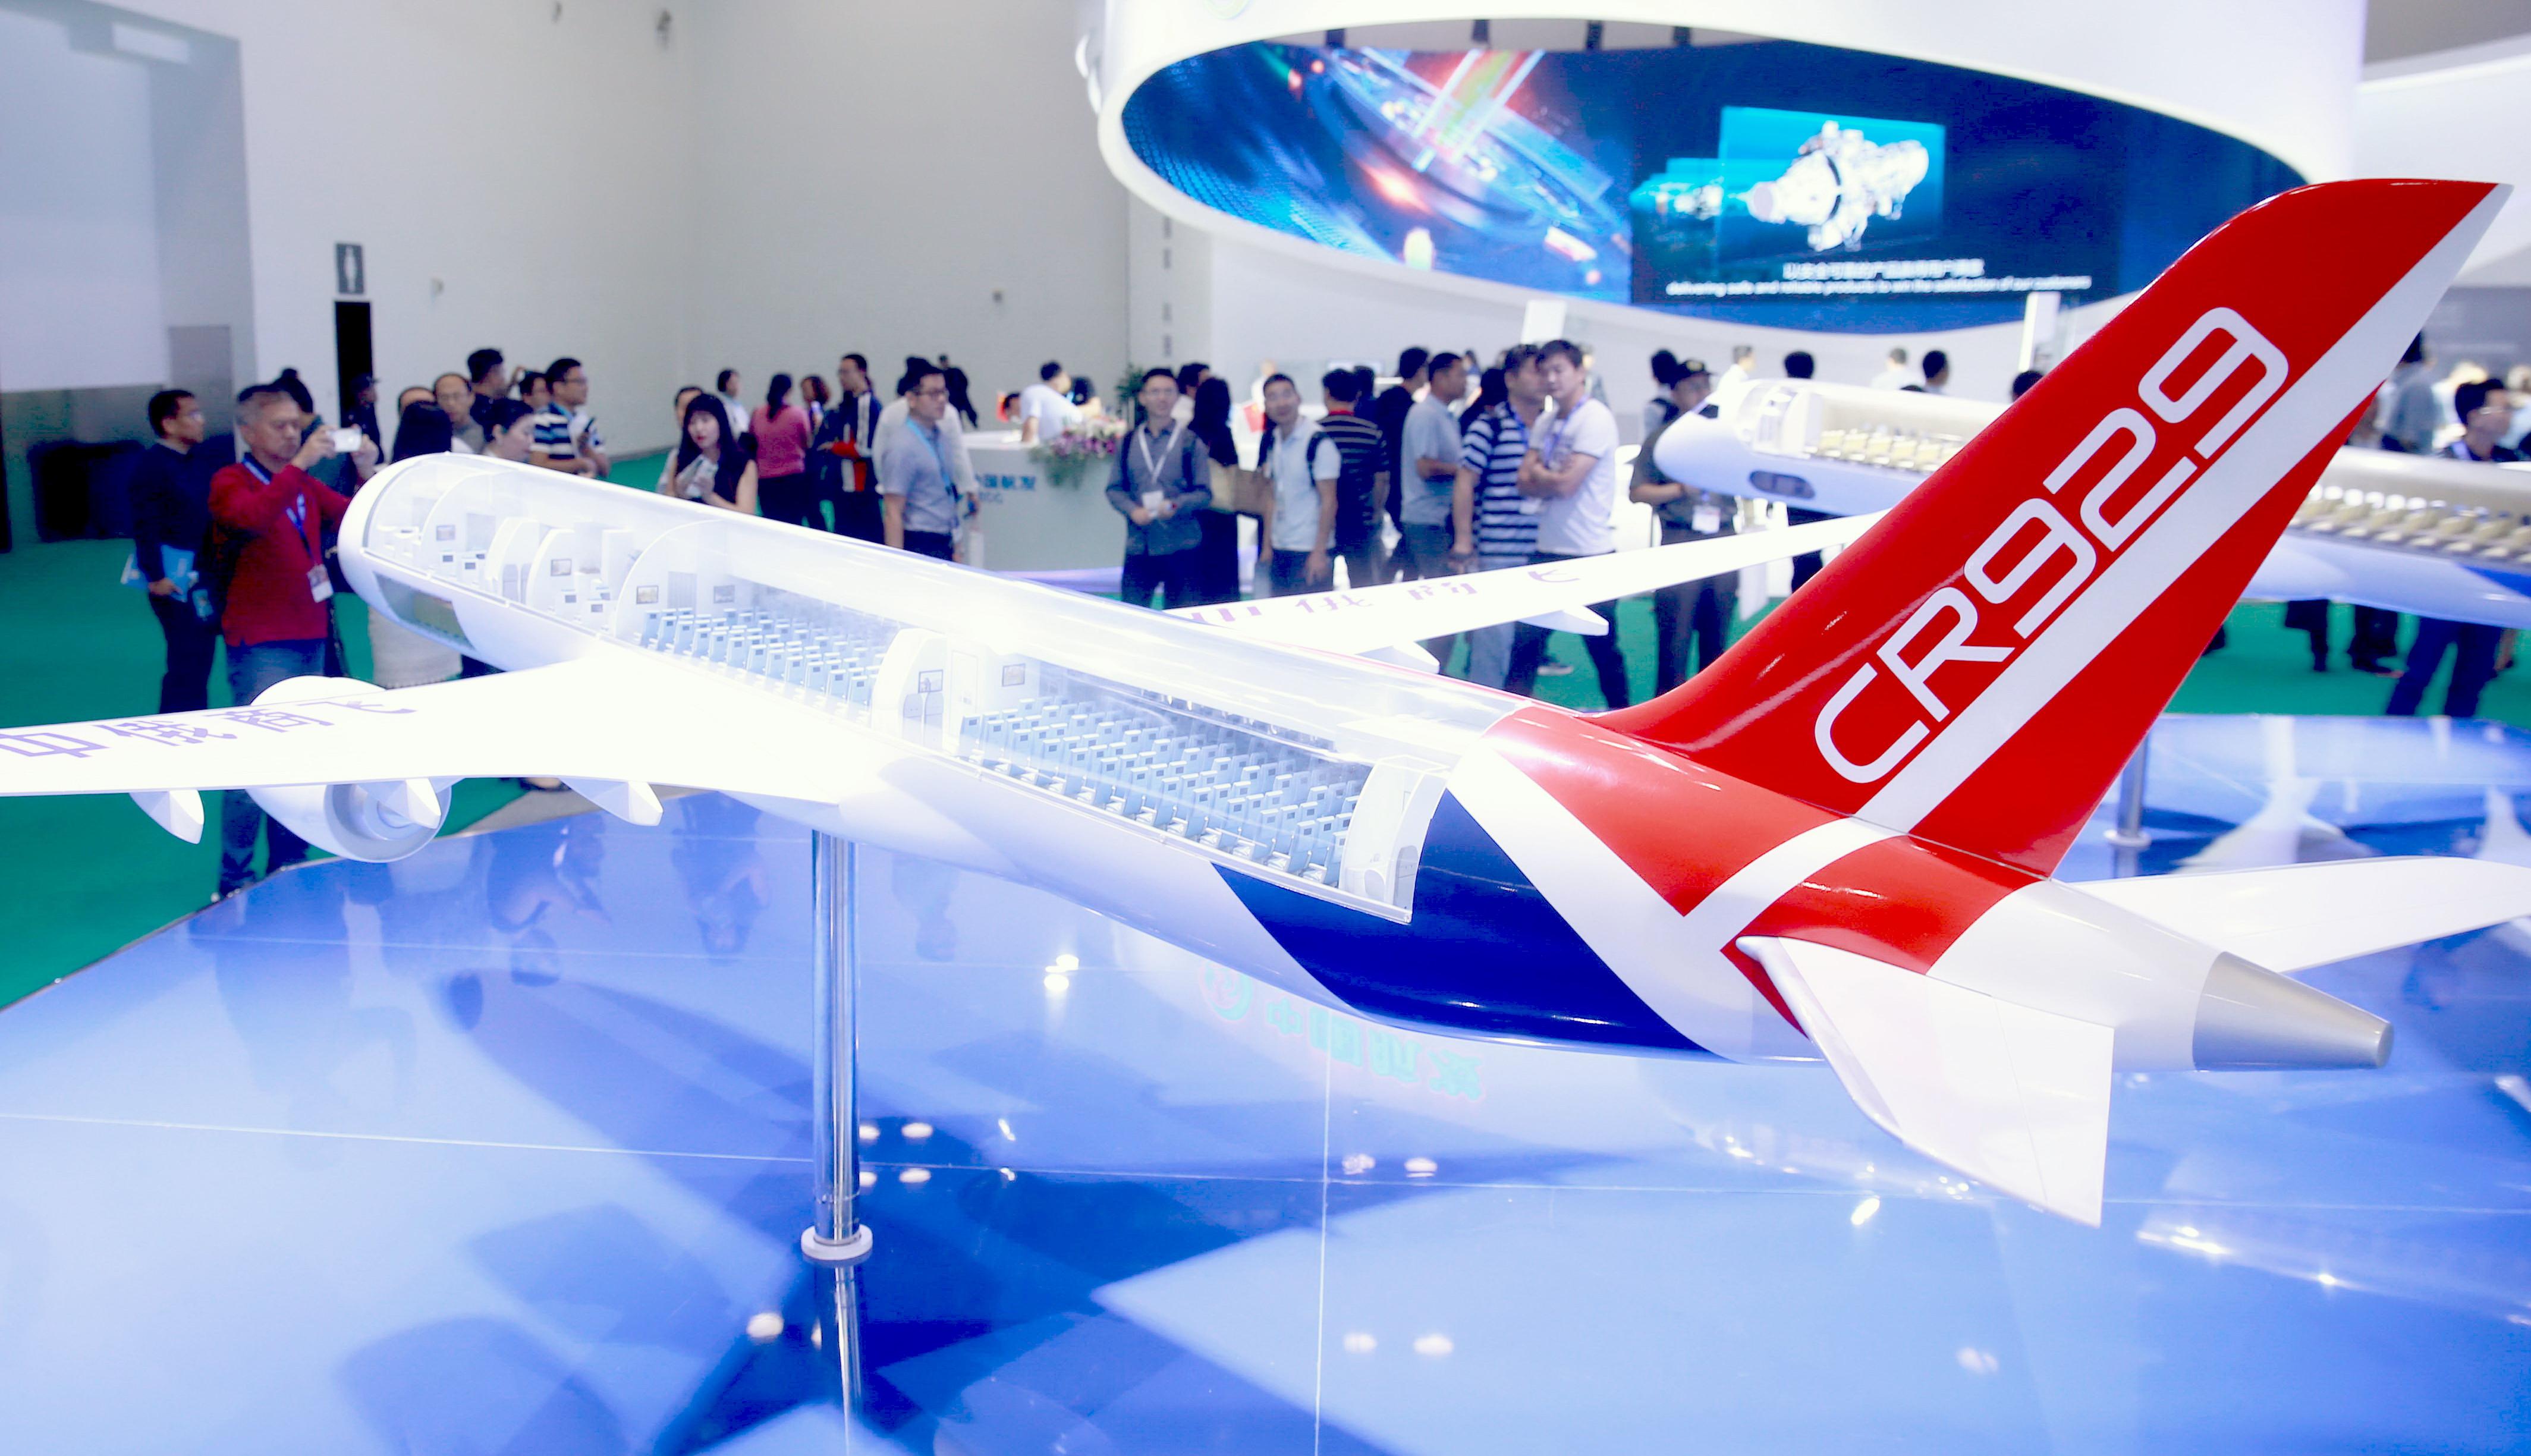 CR929 jetliner to hit global market in 2023